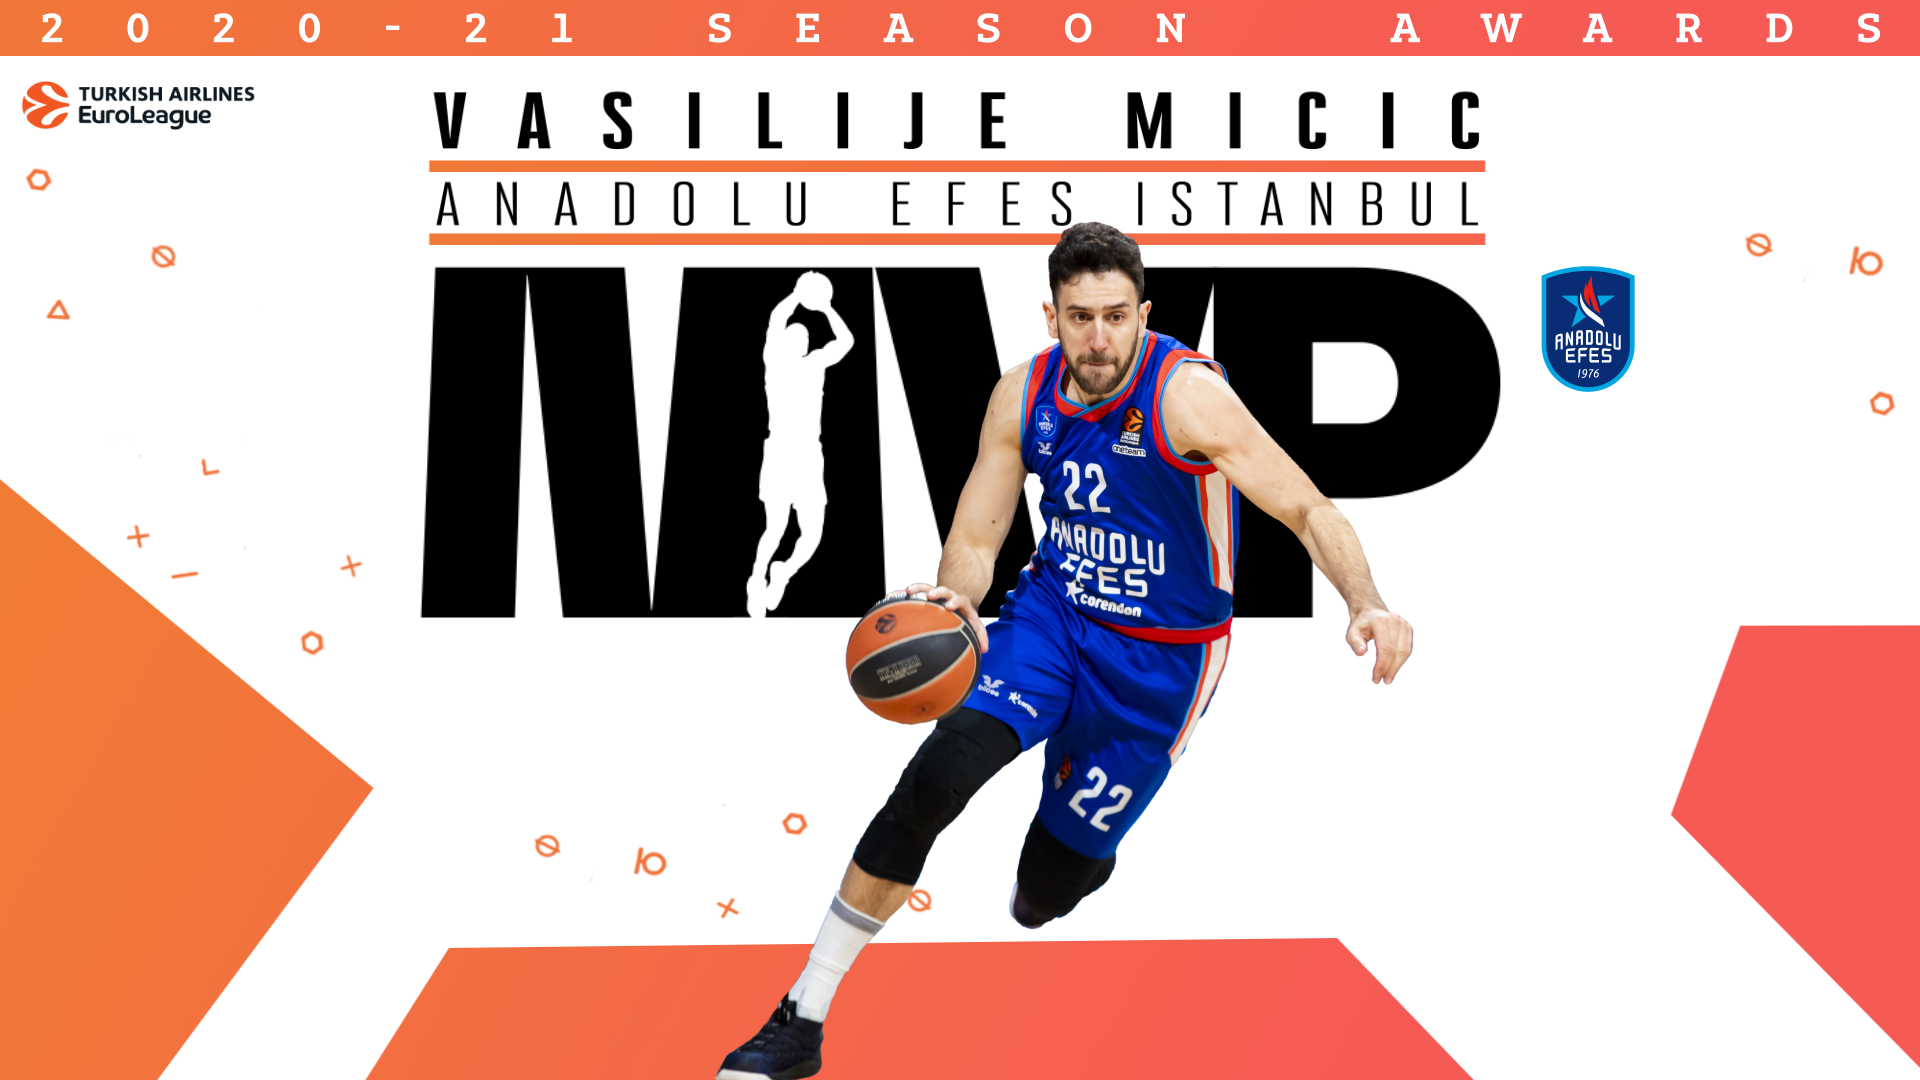 Anadolu-Efes-Vasilije-Micic.png